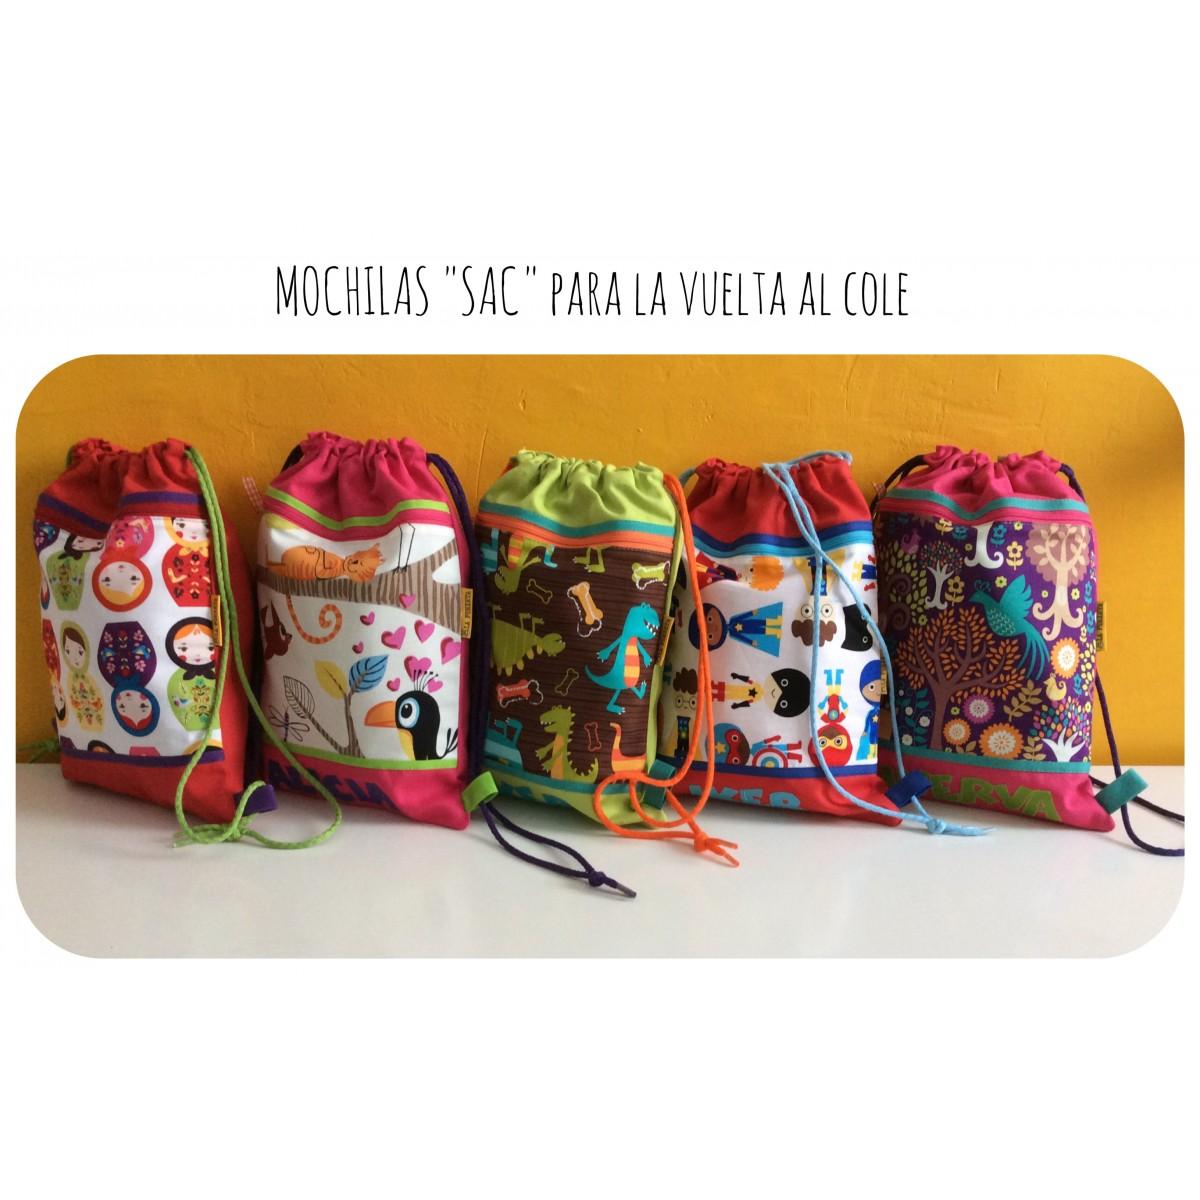 Mochila Sac personalizada